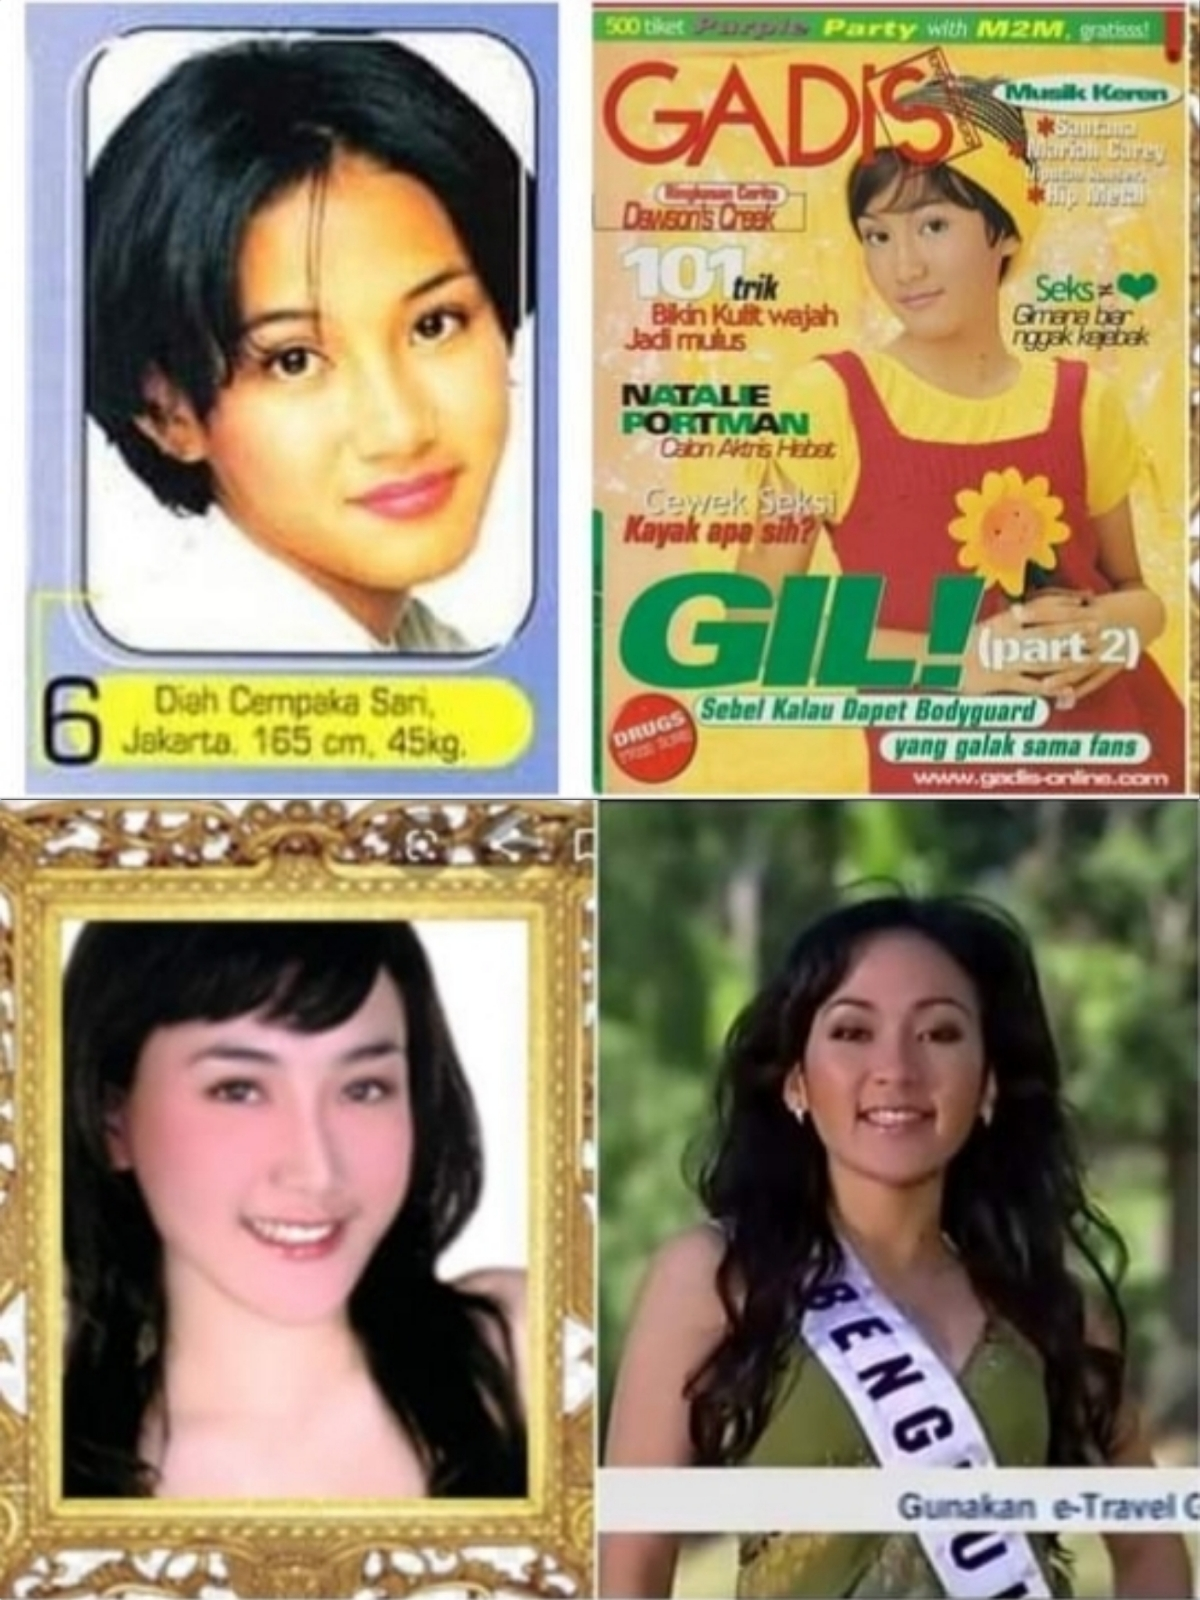 Diah-Cempaka-Sari-Gadis-Sampul-1999-Puteri-Indonesia-Bengkulu-2008